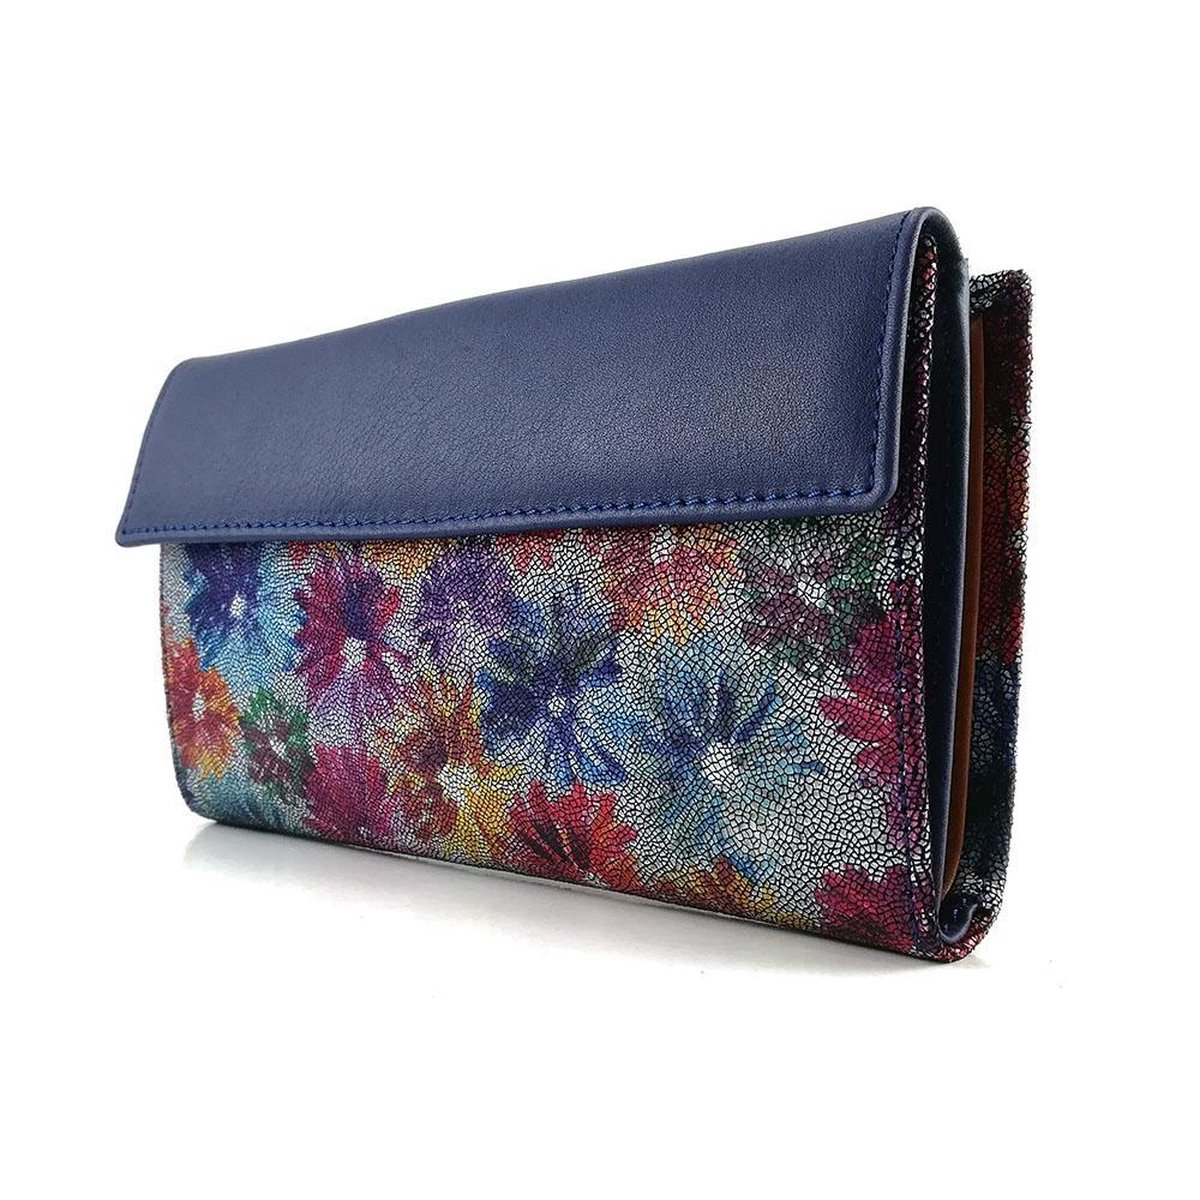 | Casanova Dames Portemonnee L Azul Blauw | Flores